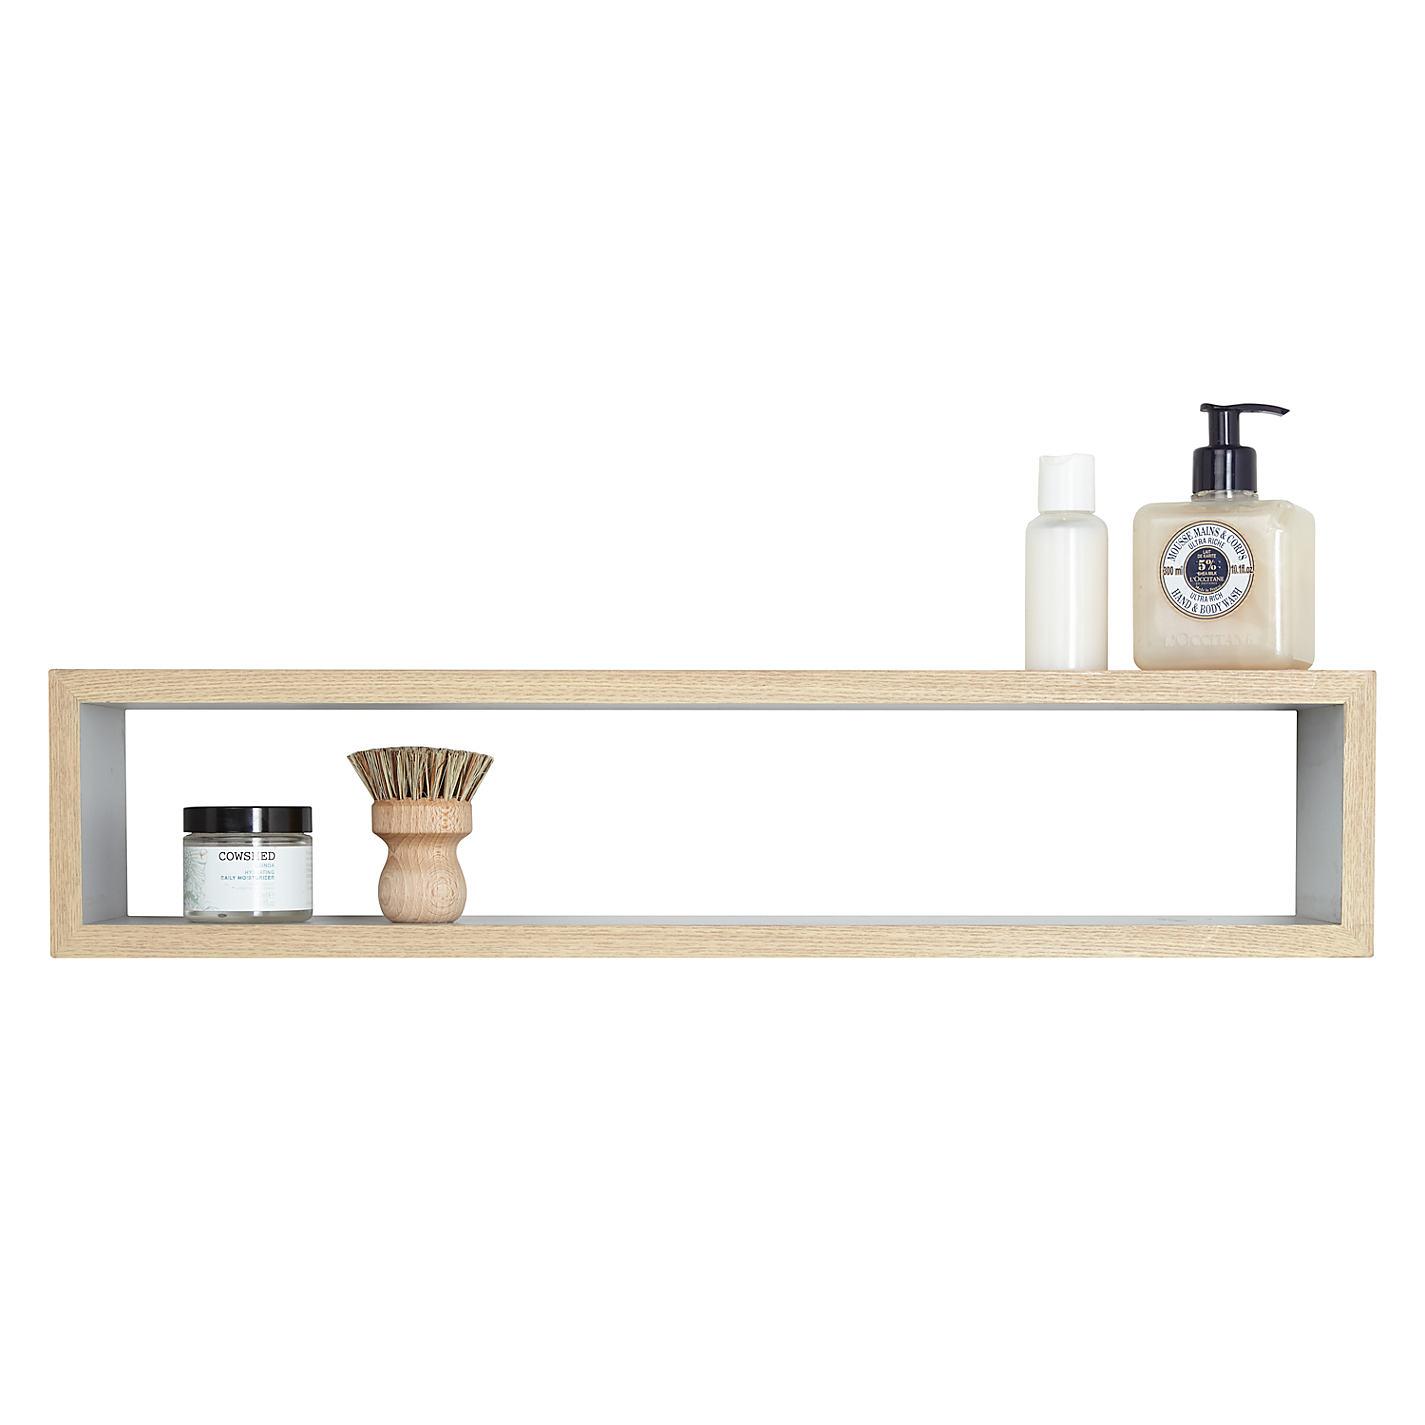 Bathroom accessories john lewis -  Buy Design Project By John Lewis No 008 Rectangular Bathroom Wall Shelf Online At Johnlewis